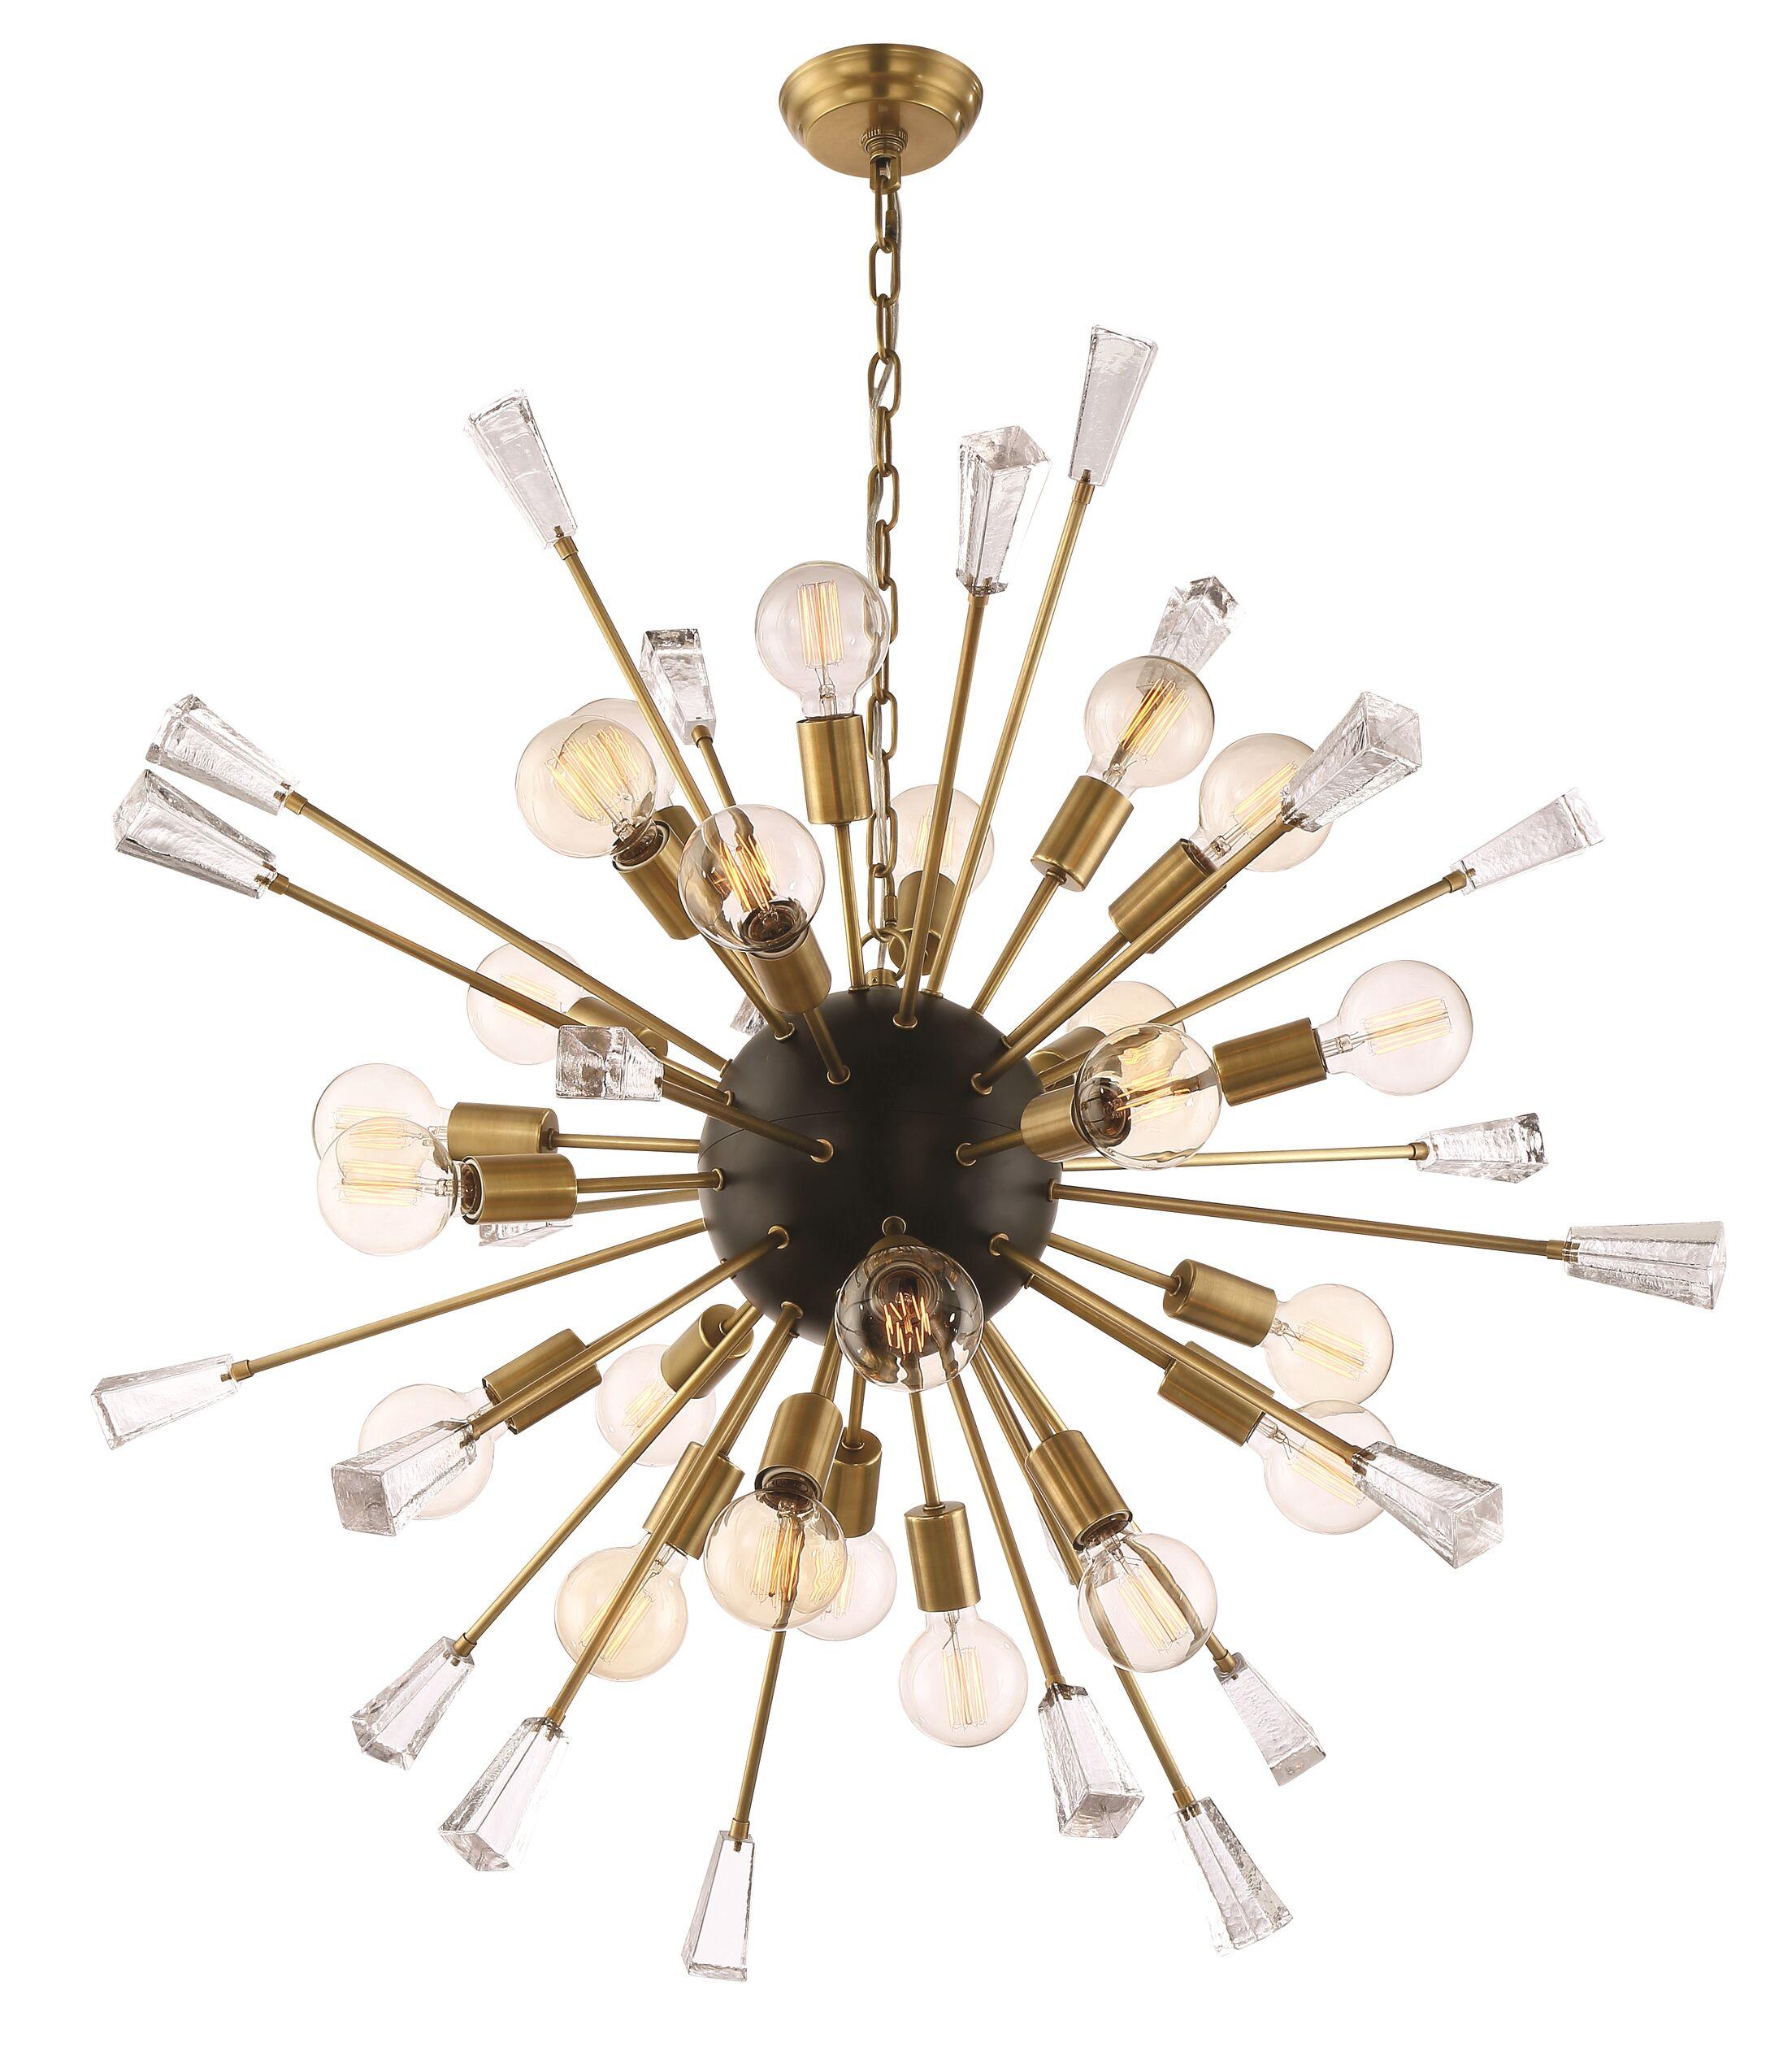 Axford 24-Light Sputnik Chandelier Finish: Aged Brass/Matte Black